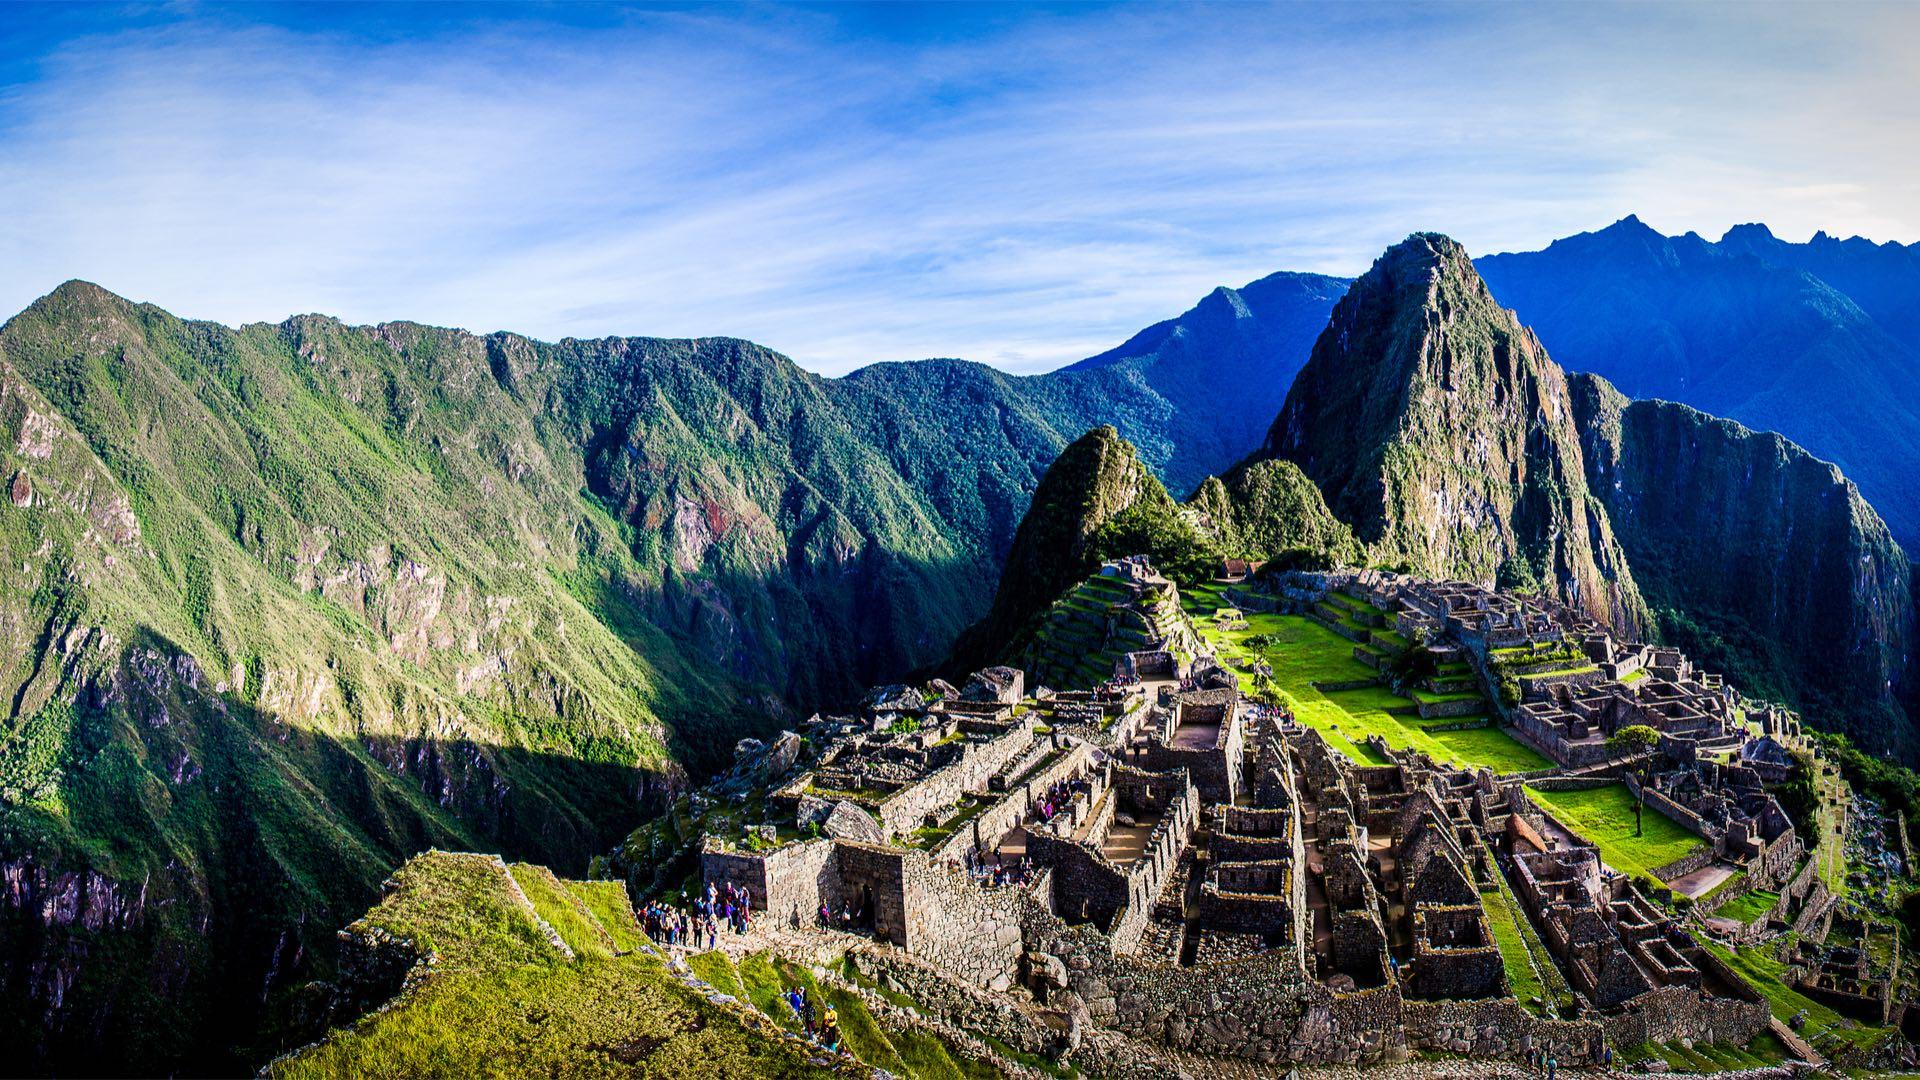 Peru | Machu Picchu | ©Mario Dias/shutterstock.com